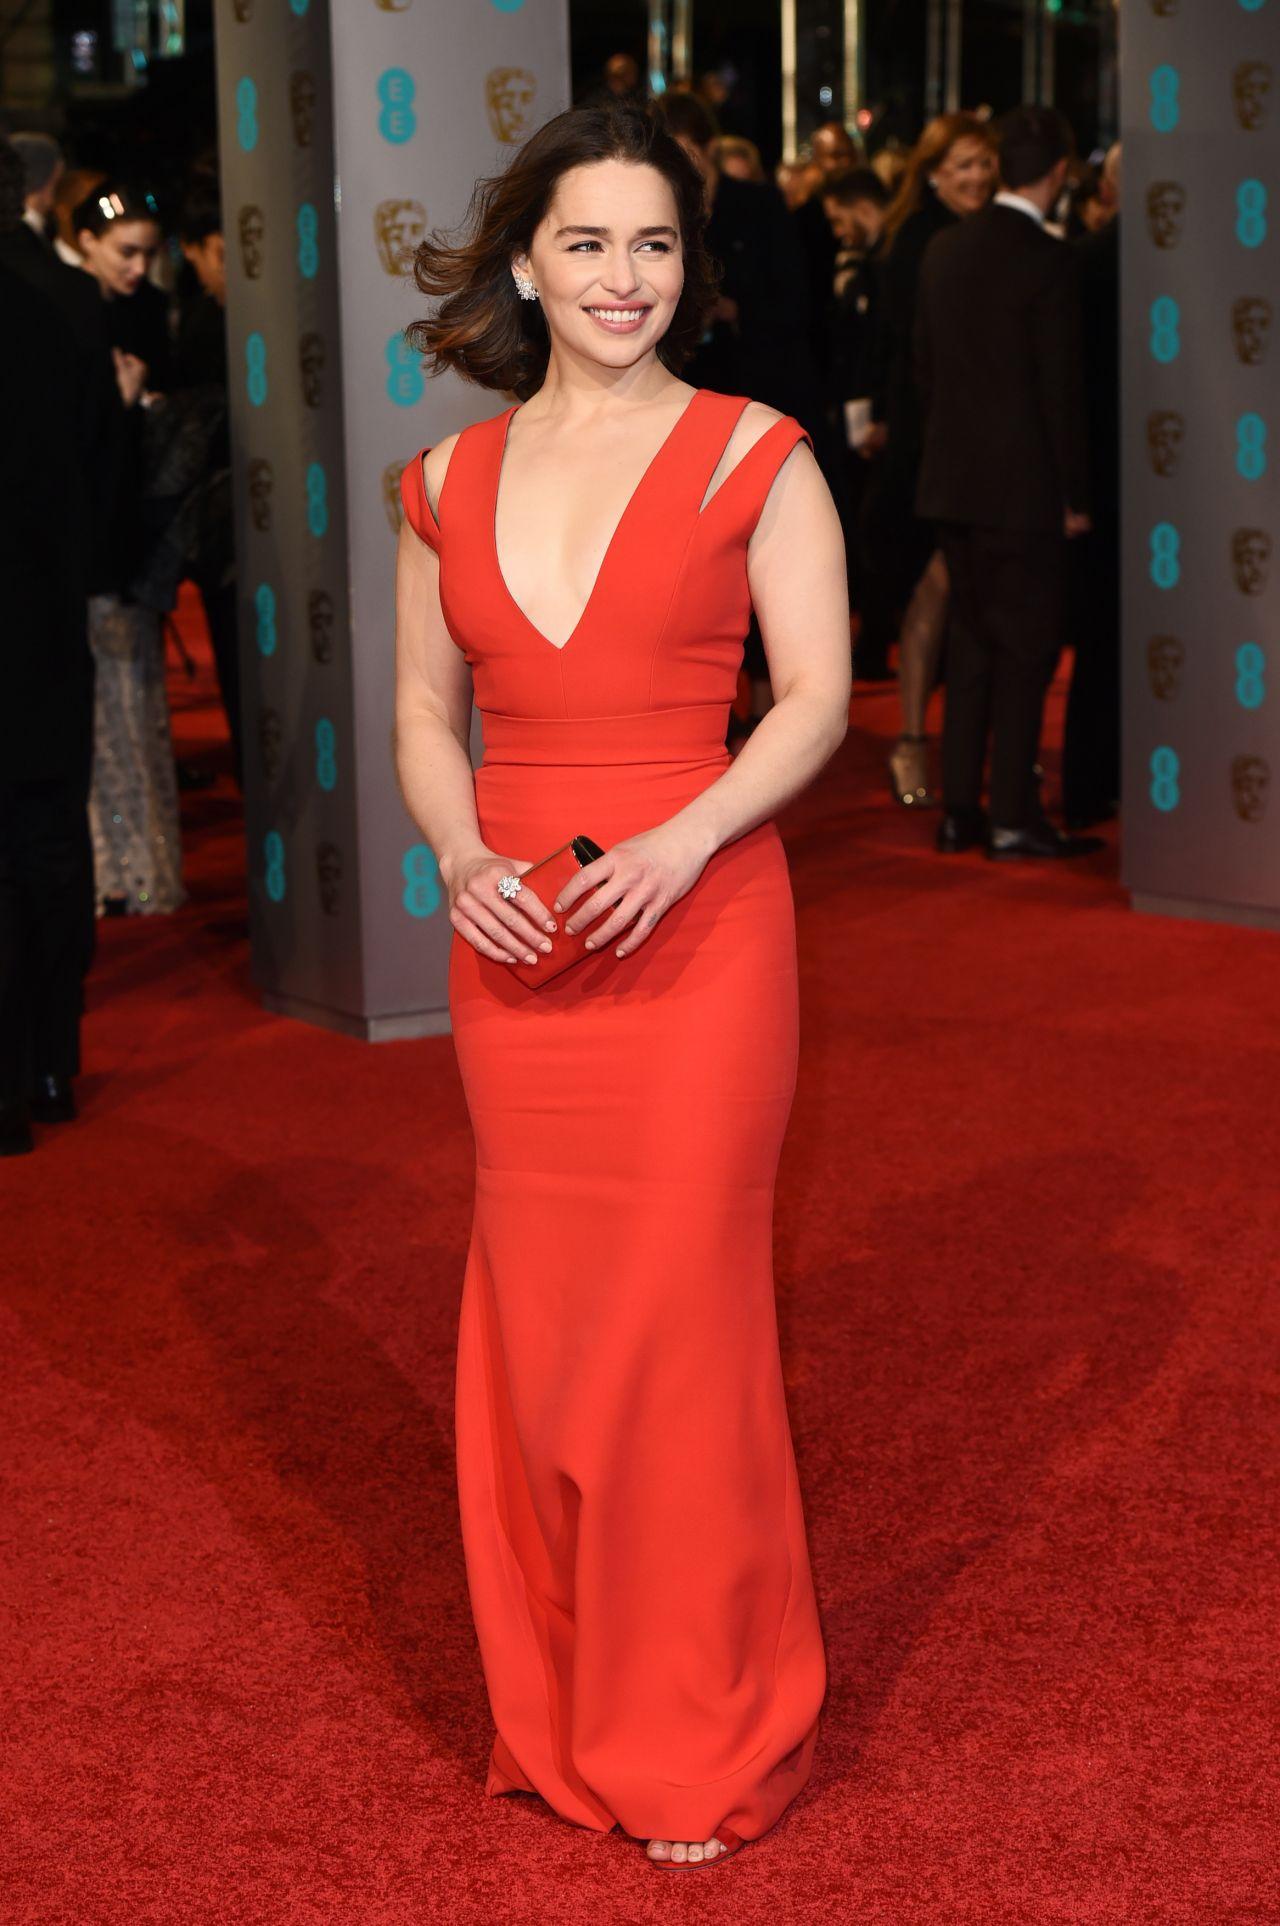 emilia-clarke-bafta-film-awards-2016-in-london-1